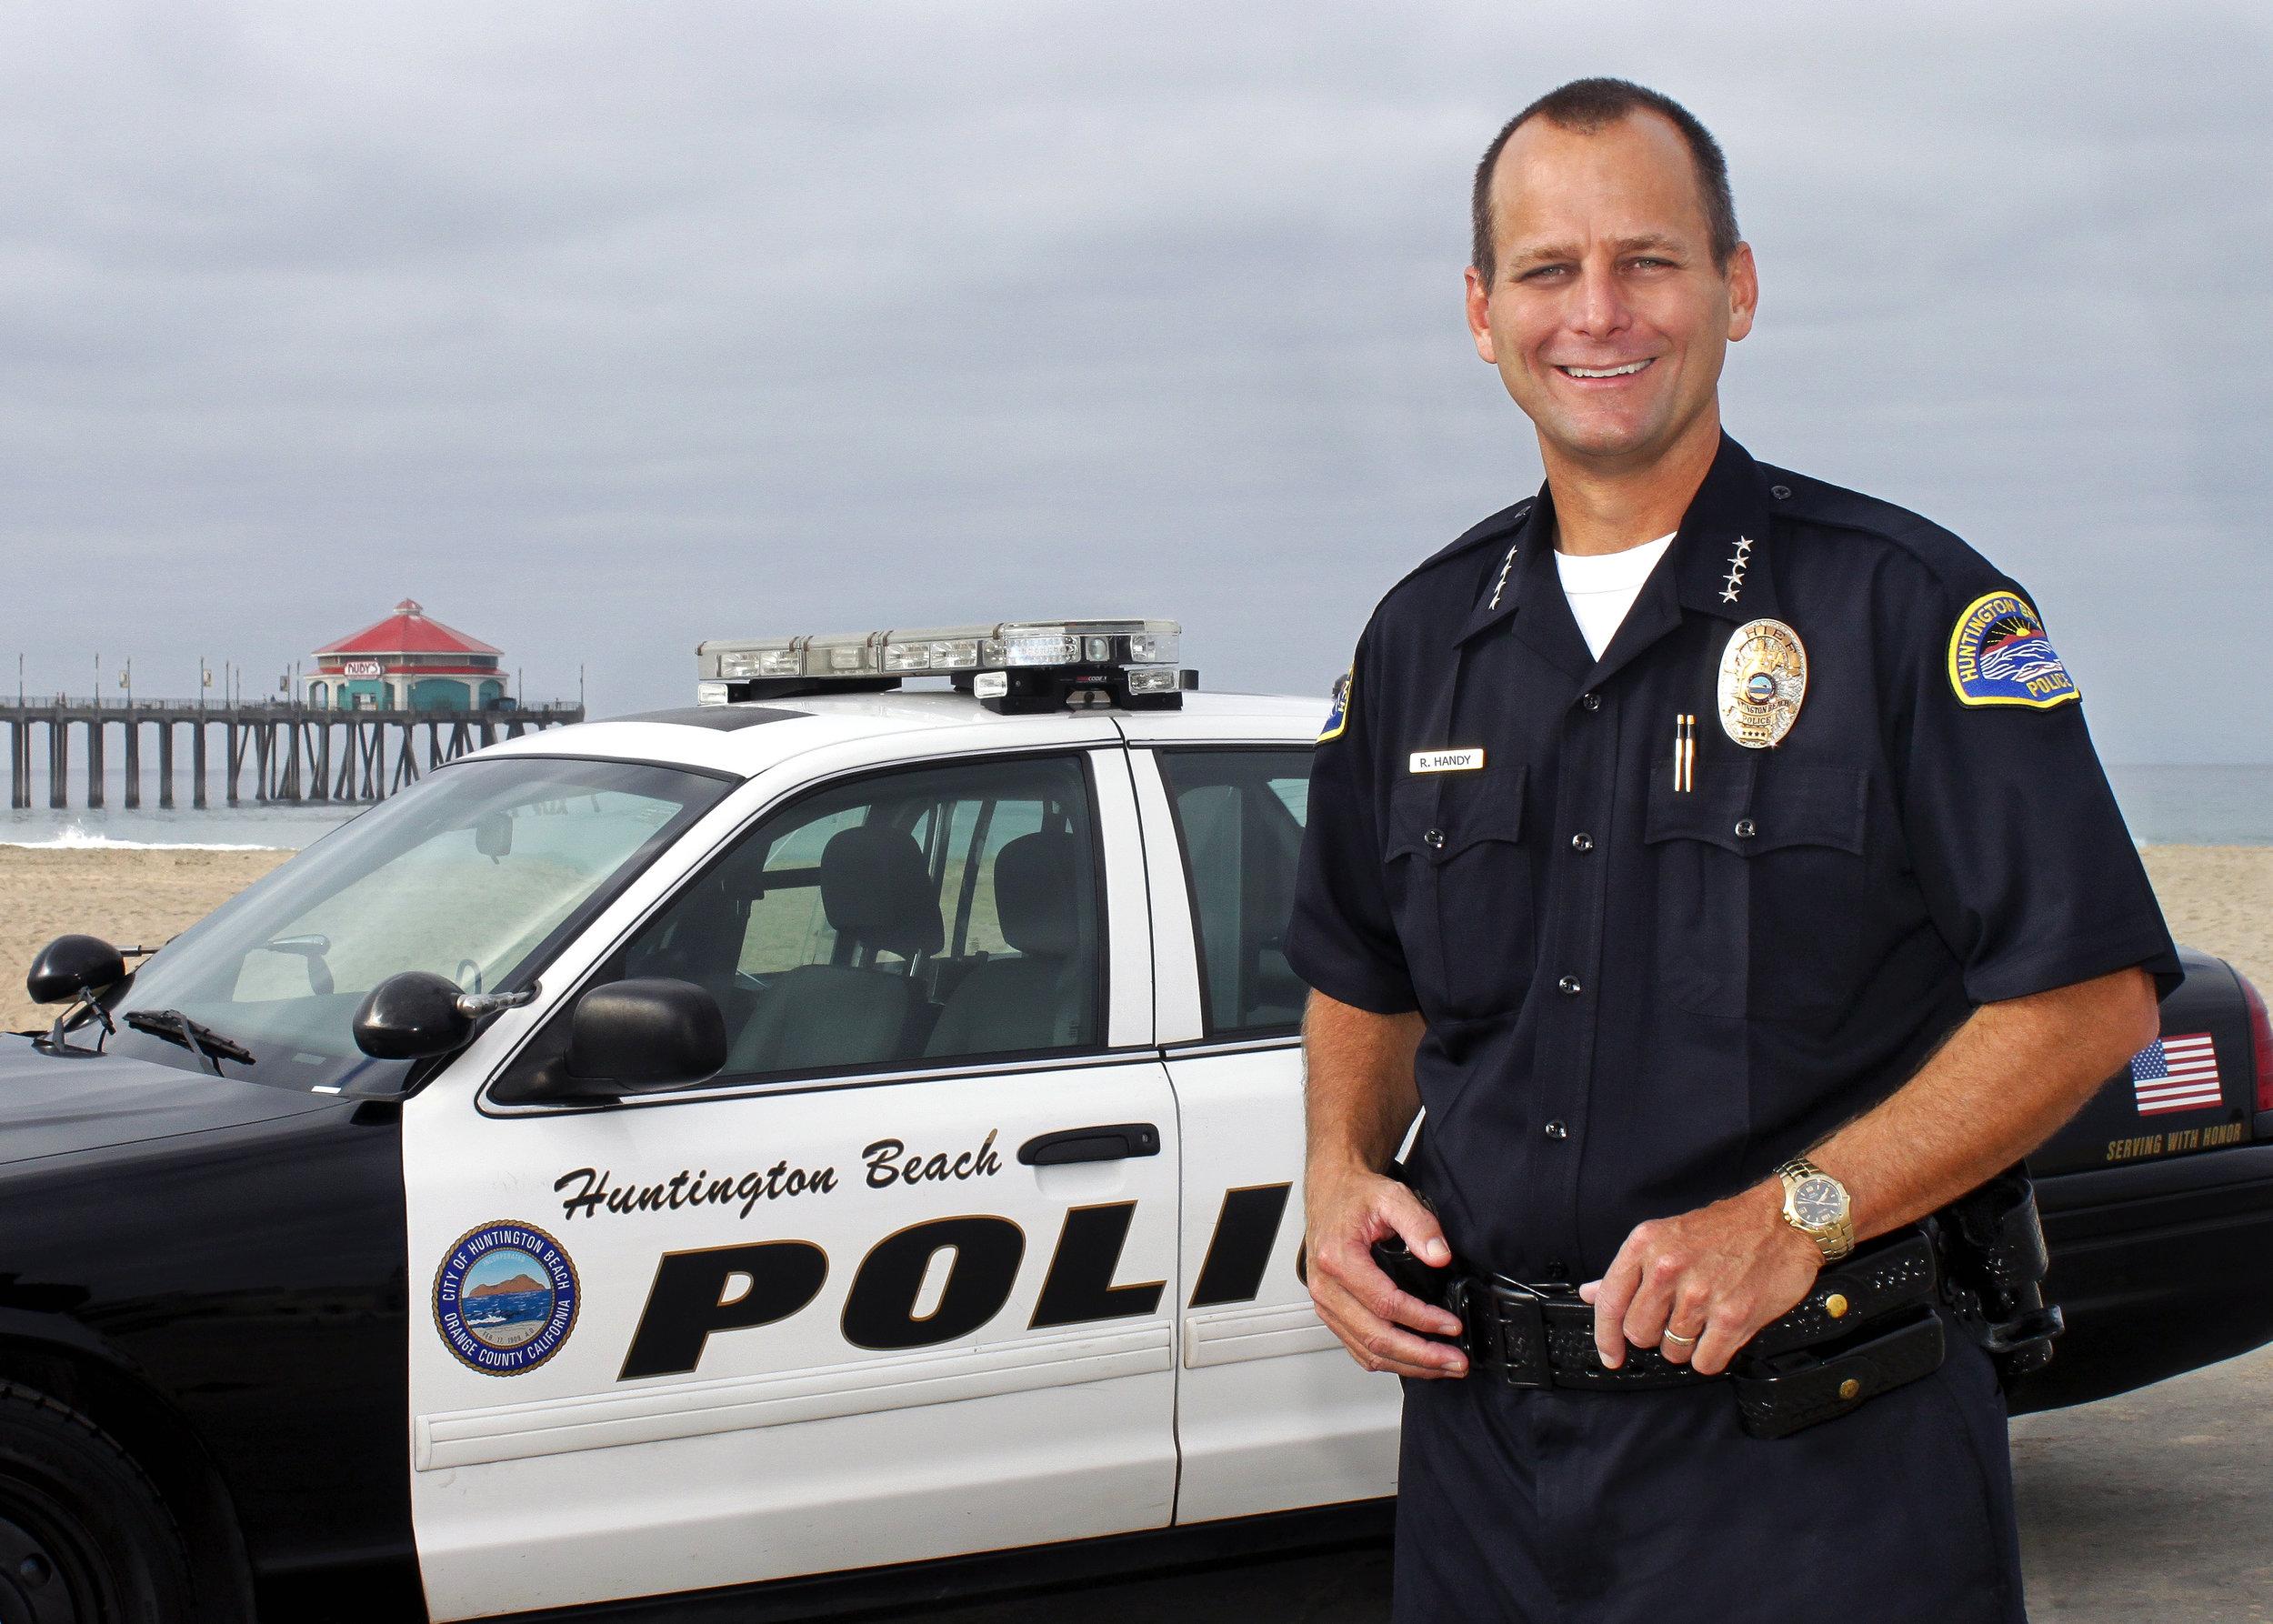 Detective Sergeant Jeff Mundy